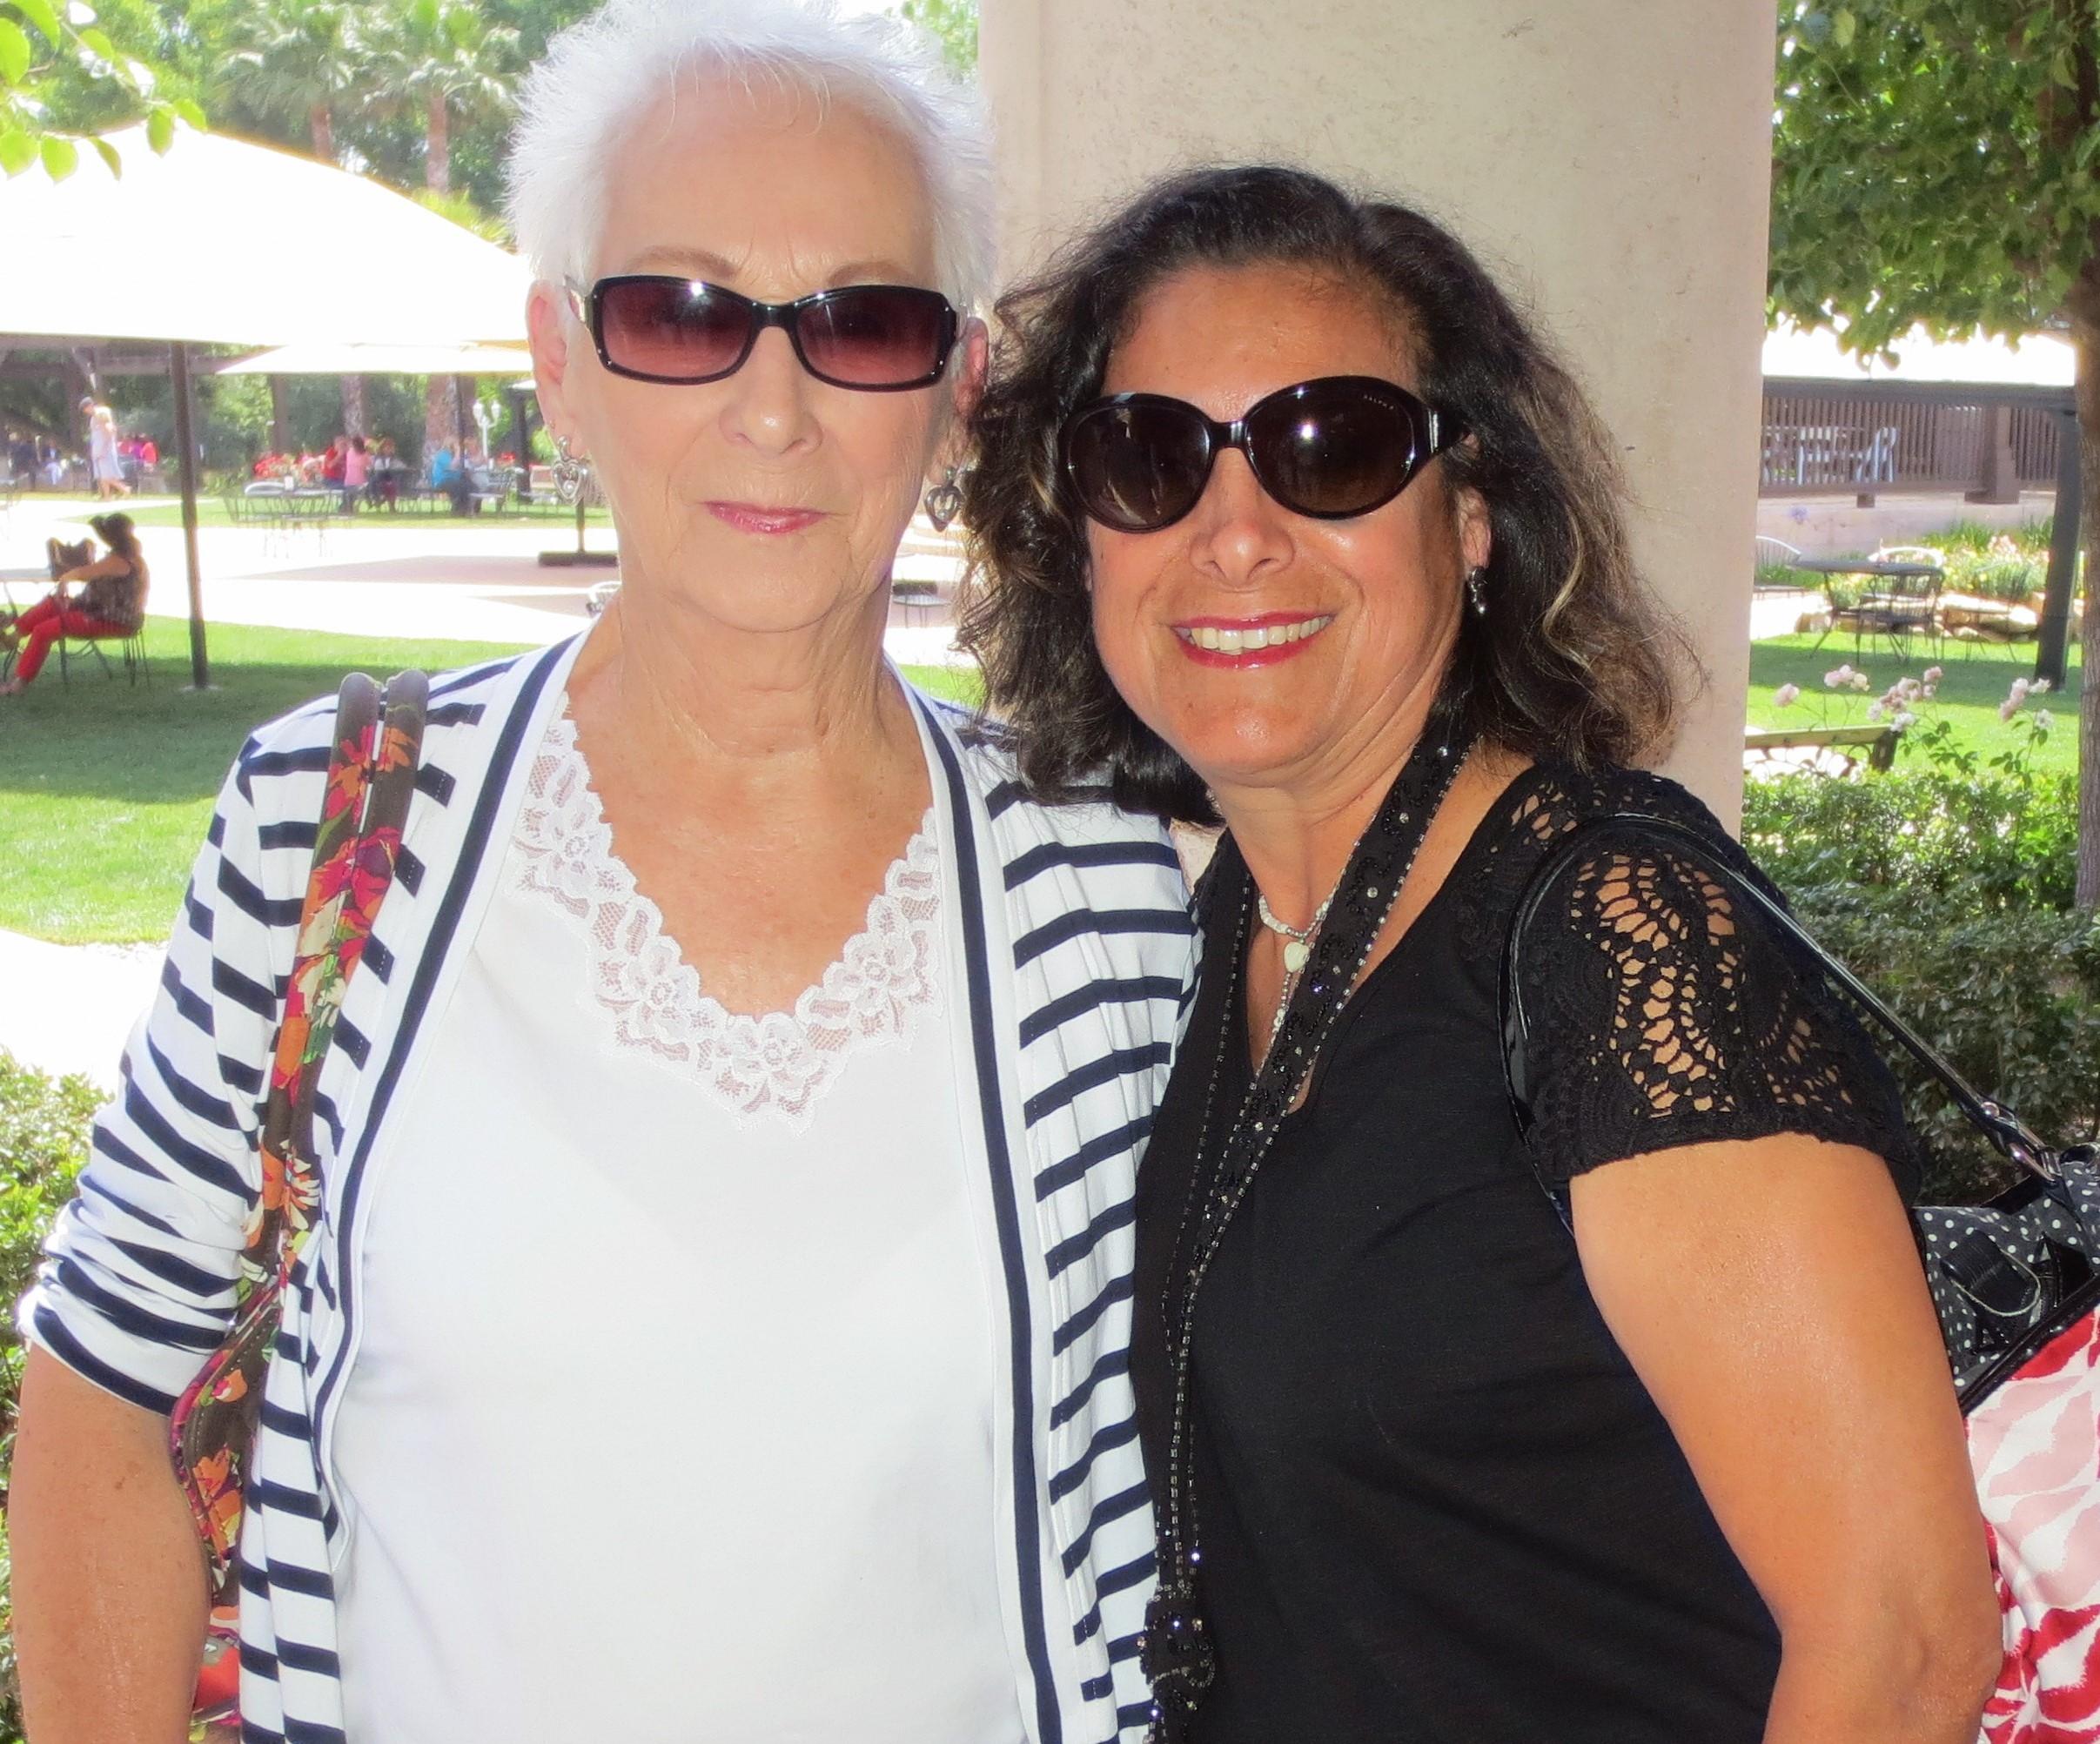 JoAnn Bowman and Audrey Schultz.JPG